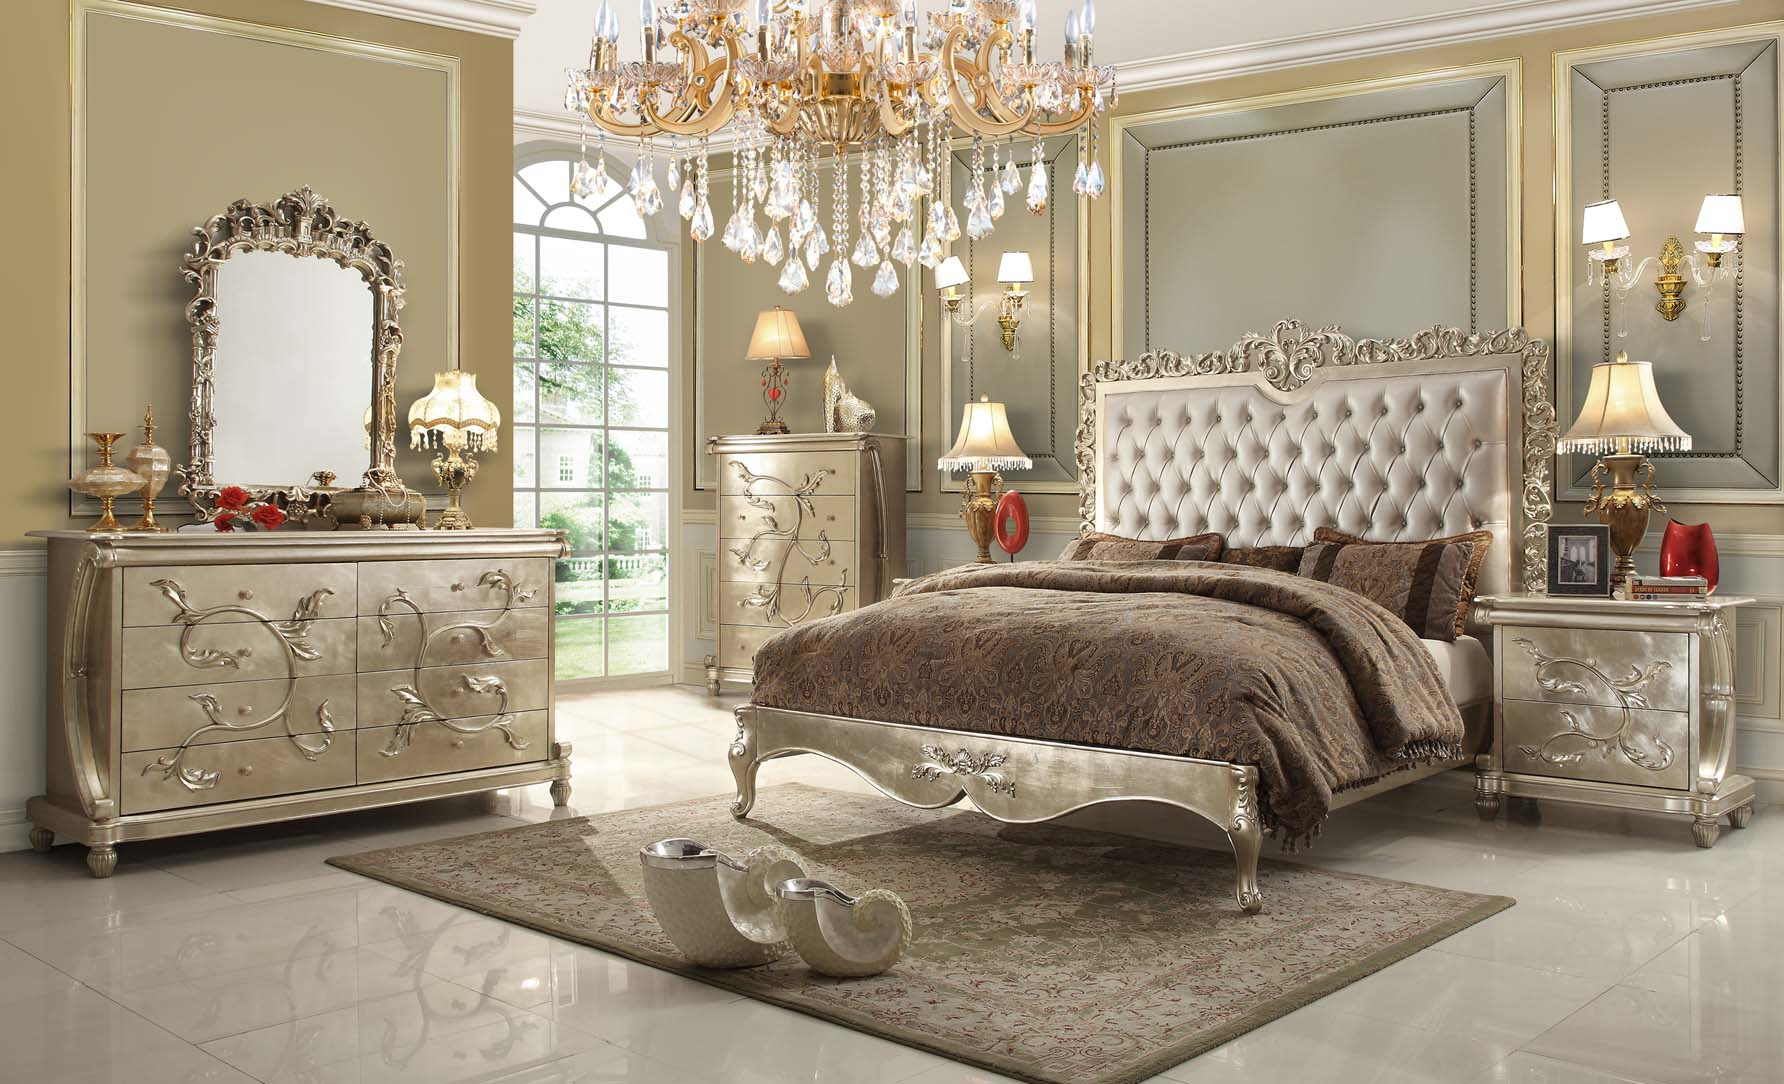 Pearl Victorian Design Bedroom Set From Homey Design